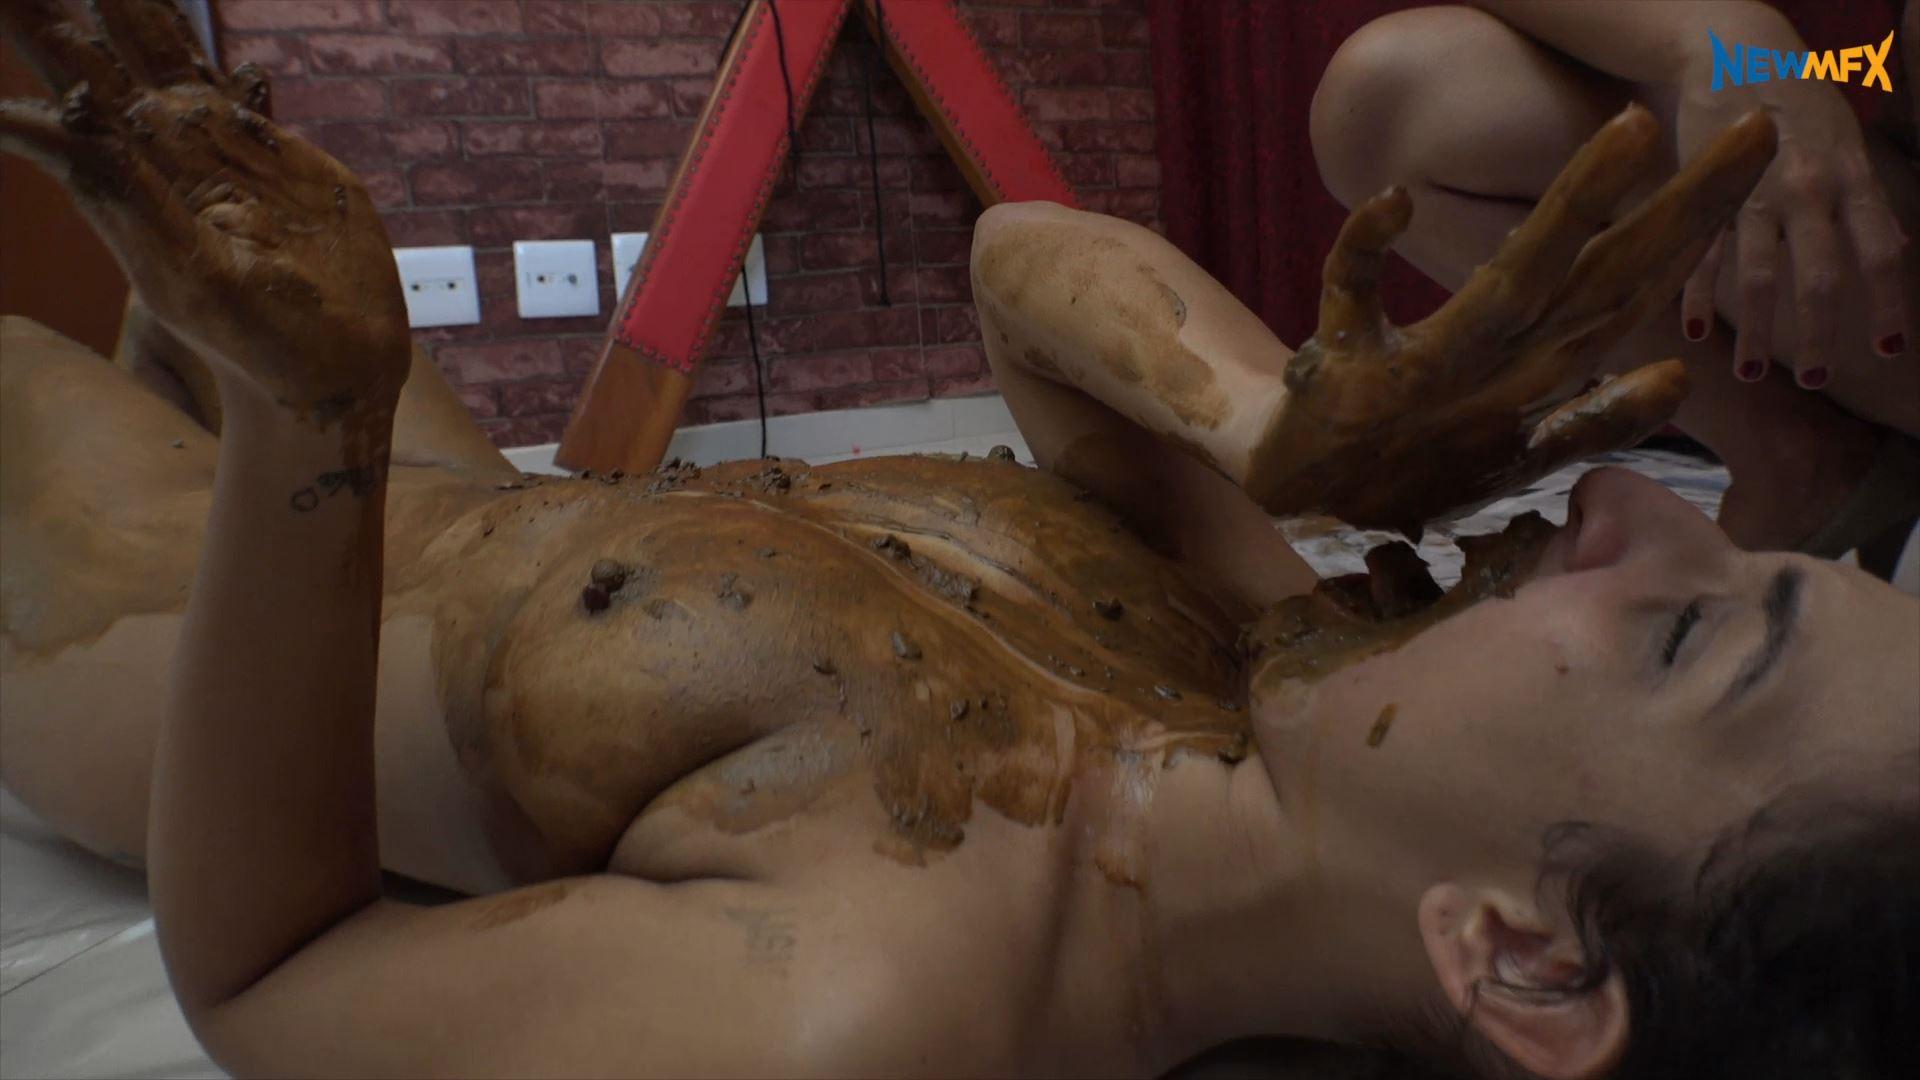 [NEW SCAT IN BRAZIL / NEWMFX] PET SLAVE. Featuring: Alana, Saori Kido [FULL HD][1080p][MP4]